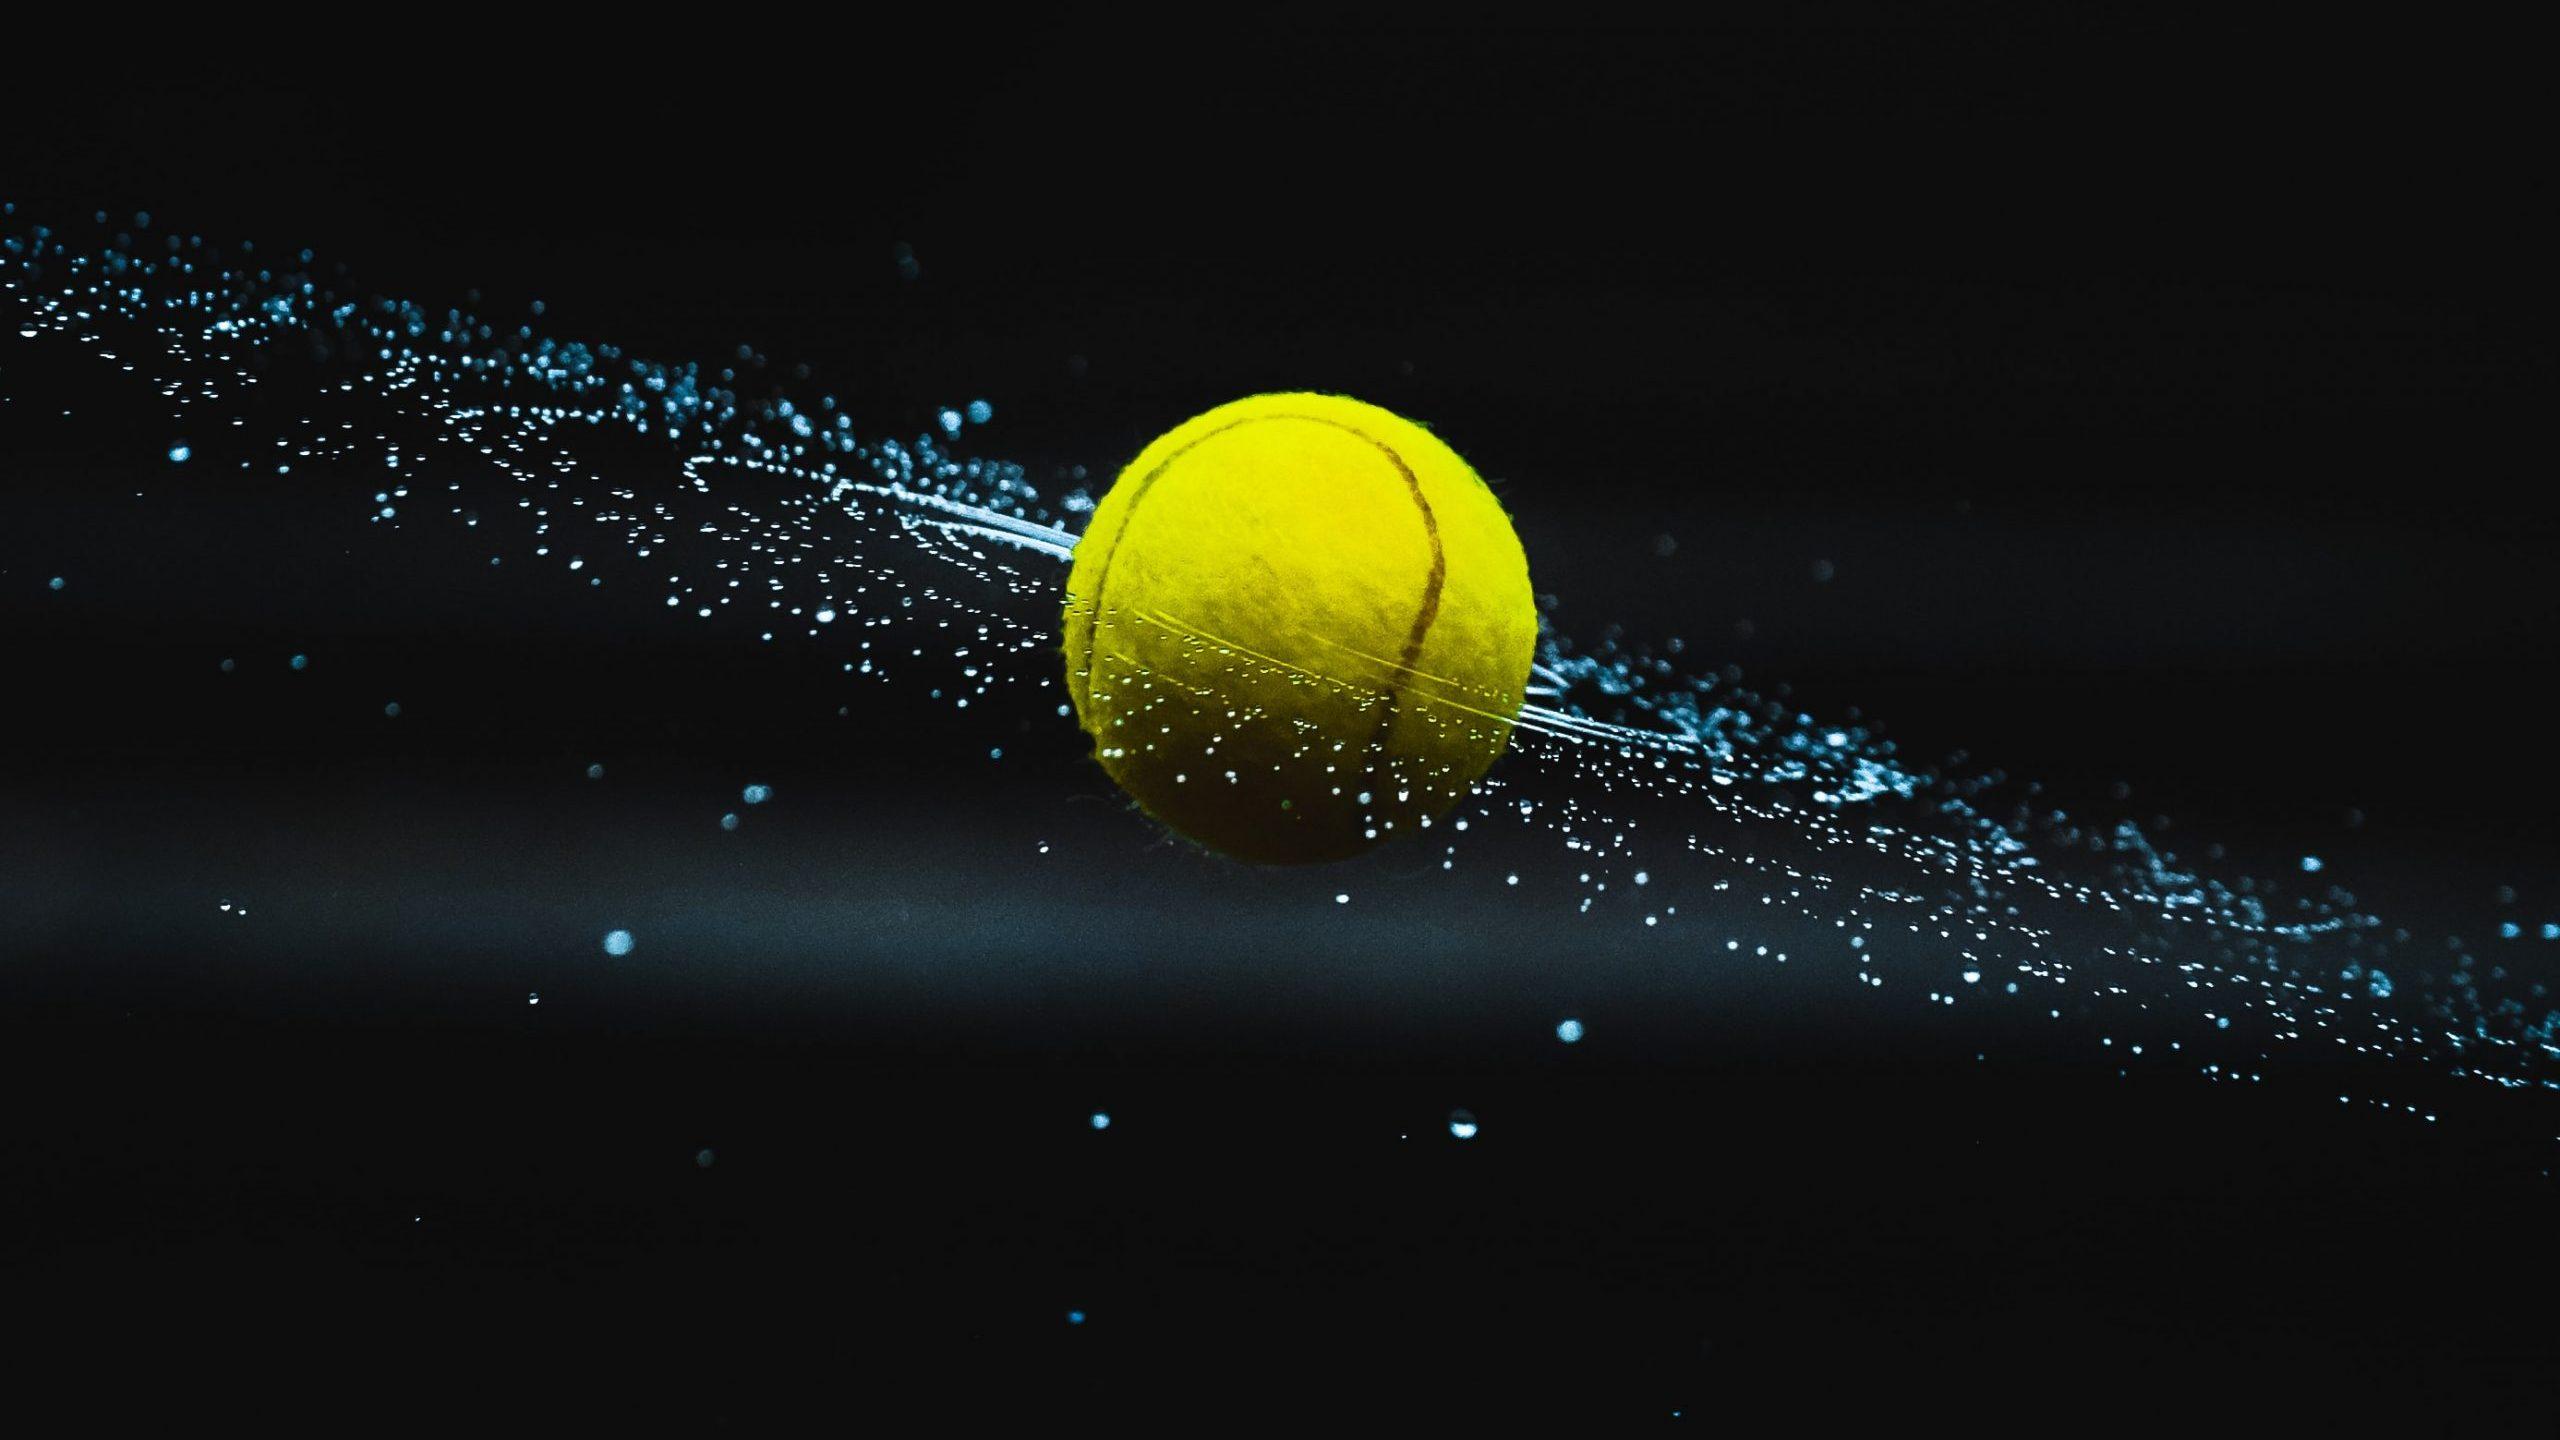 top sports startups - tennis ball flying